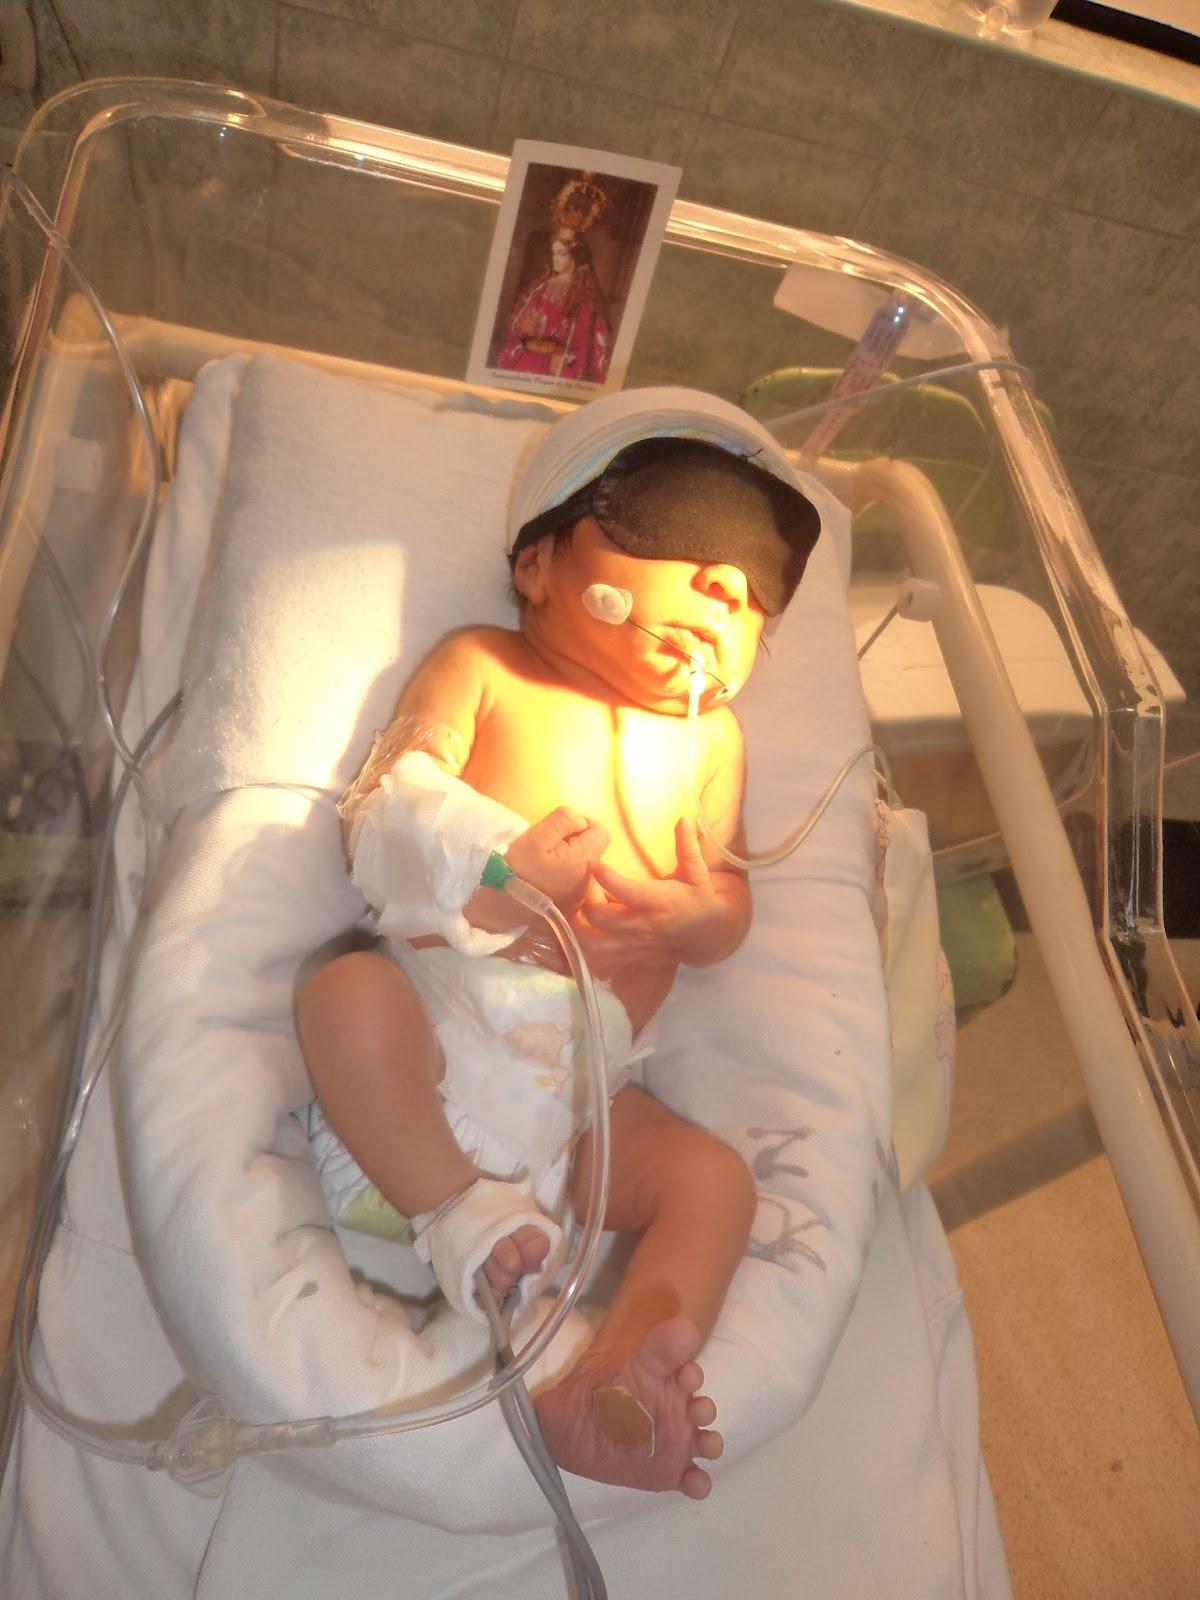 Madre joven per sietemesino - 8 meses de embarazo ...